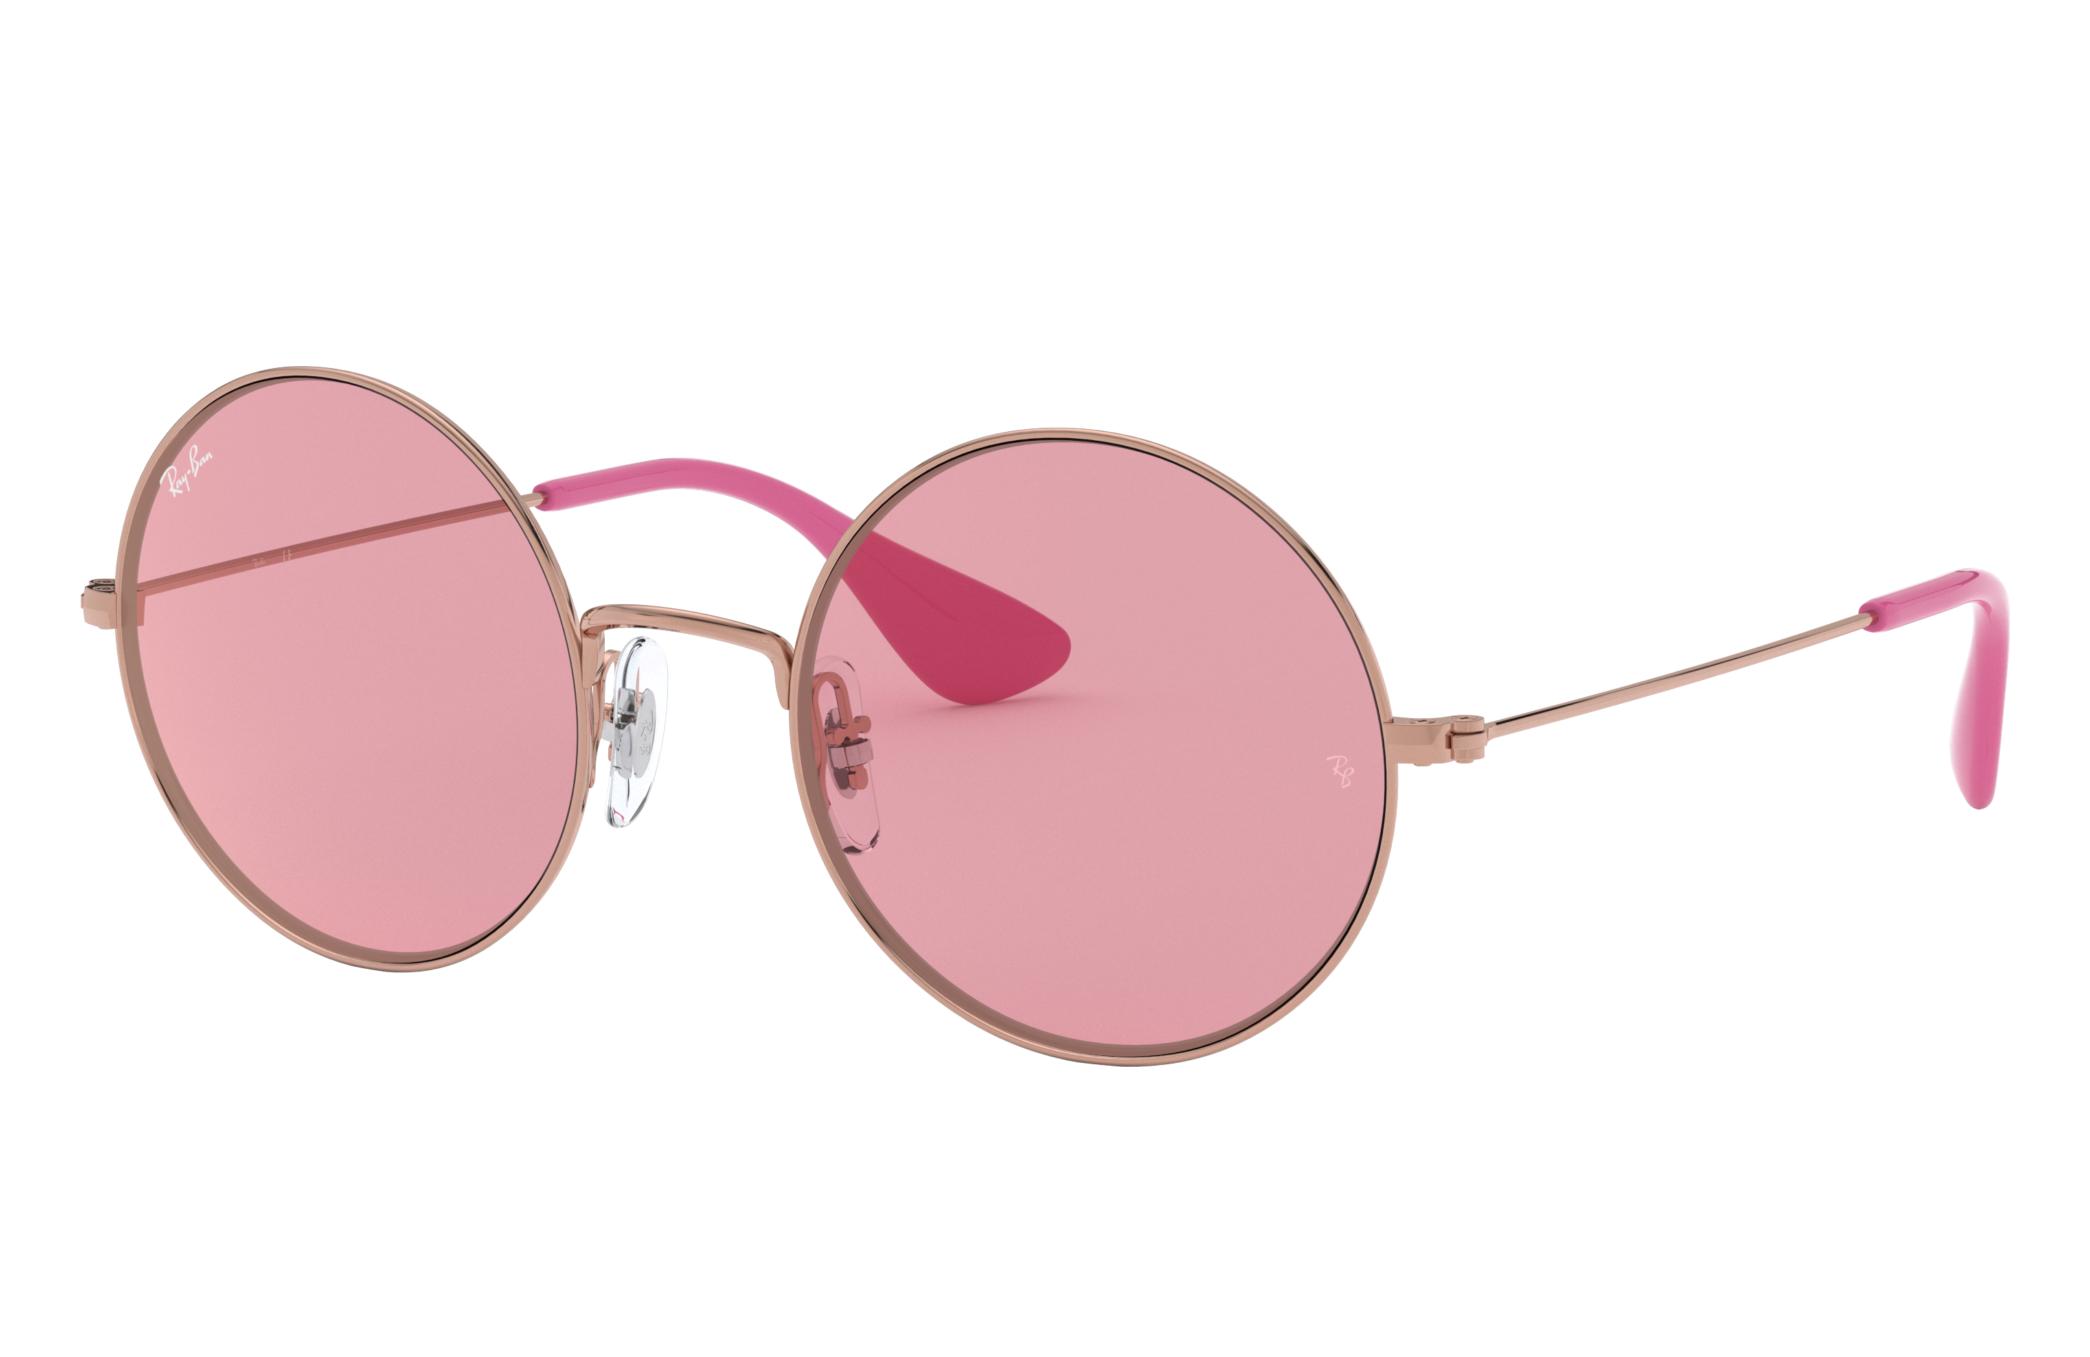 Ray-Ban Ja-jo Bronze-Copper, Pink Lenses - RB3592